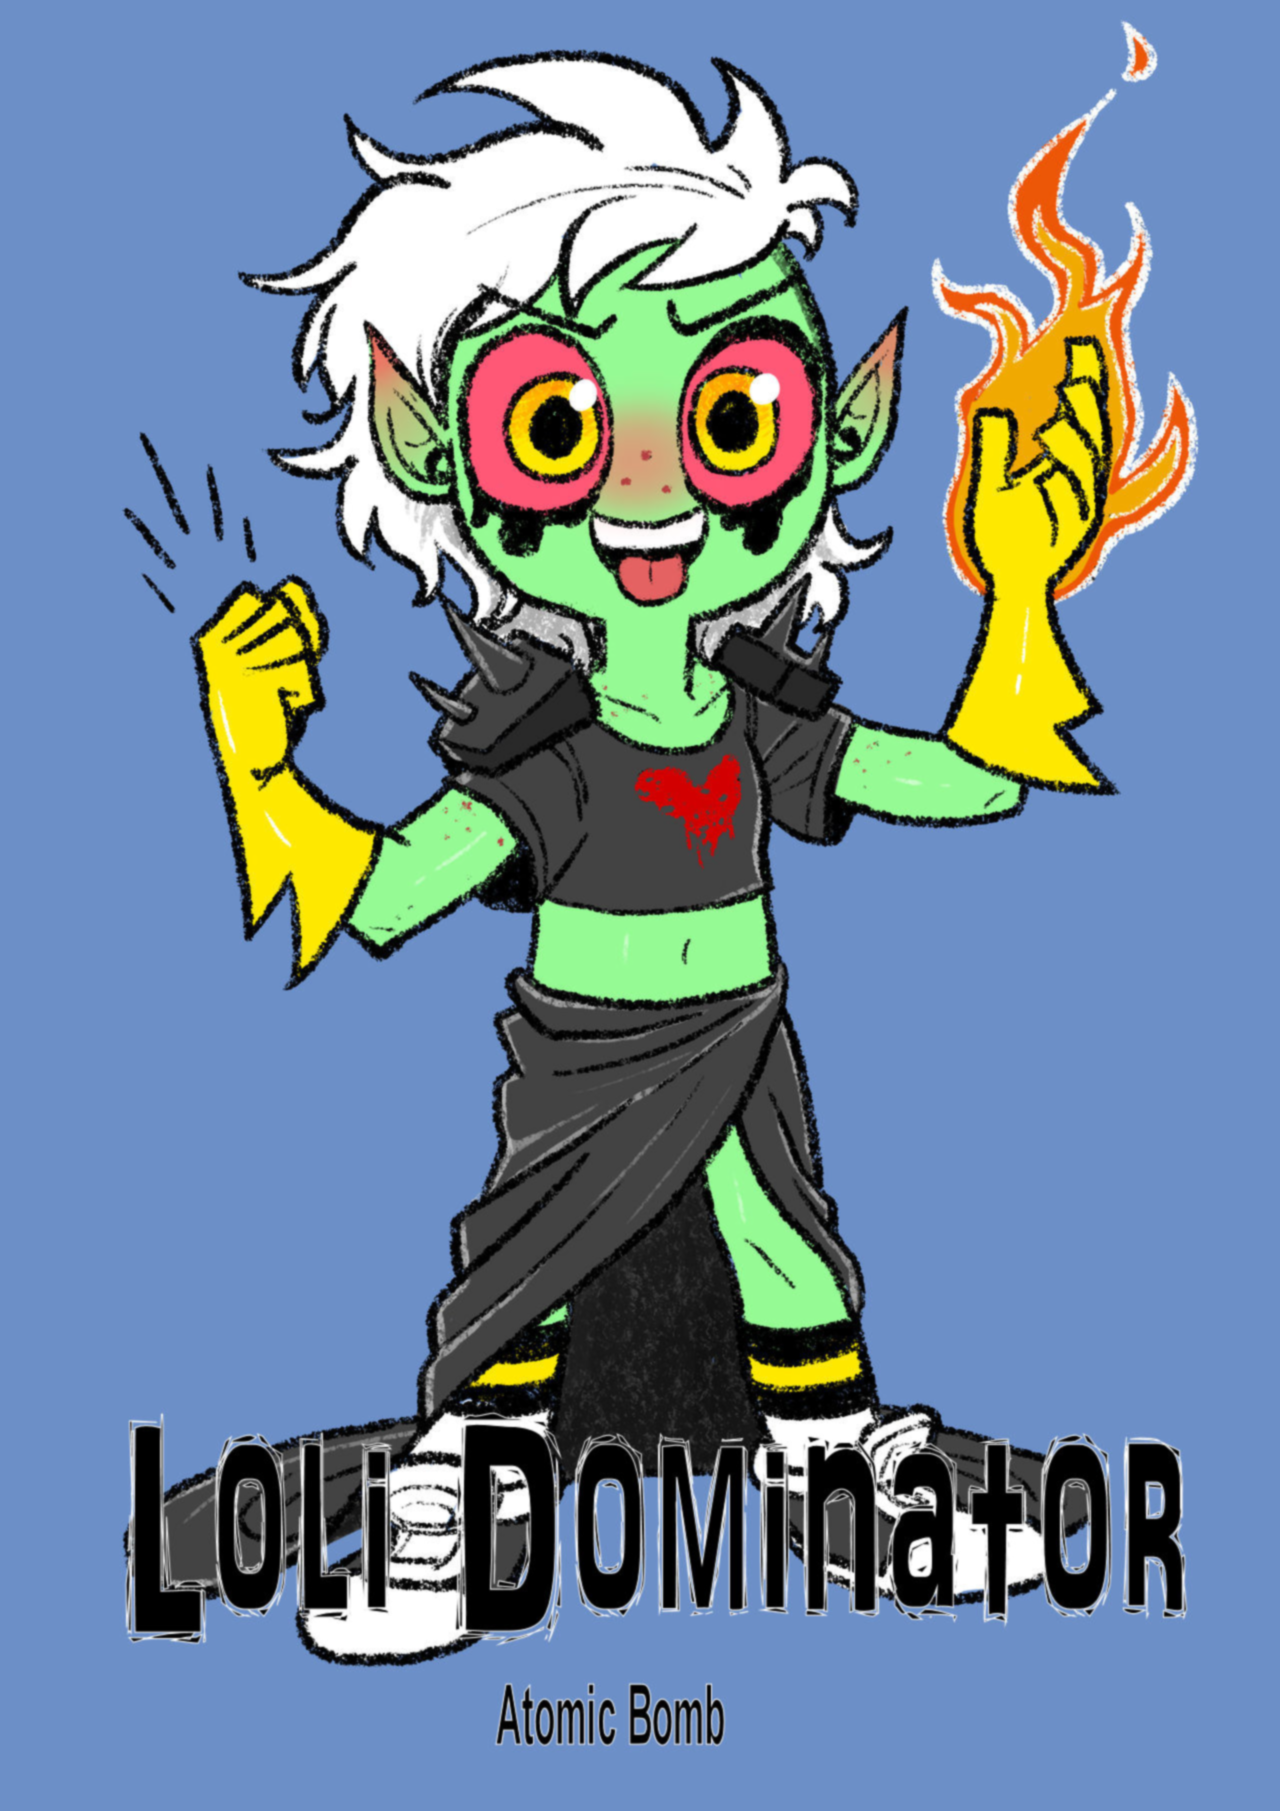 SureFap xxx porno Wander Over Yonder - [Atomic Bomb] - Loli Dominator